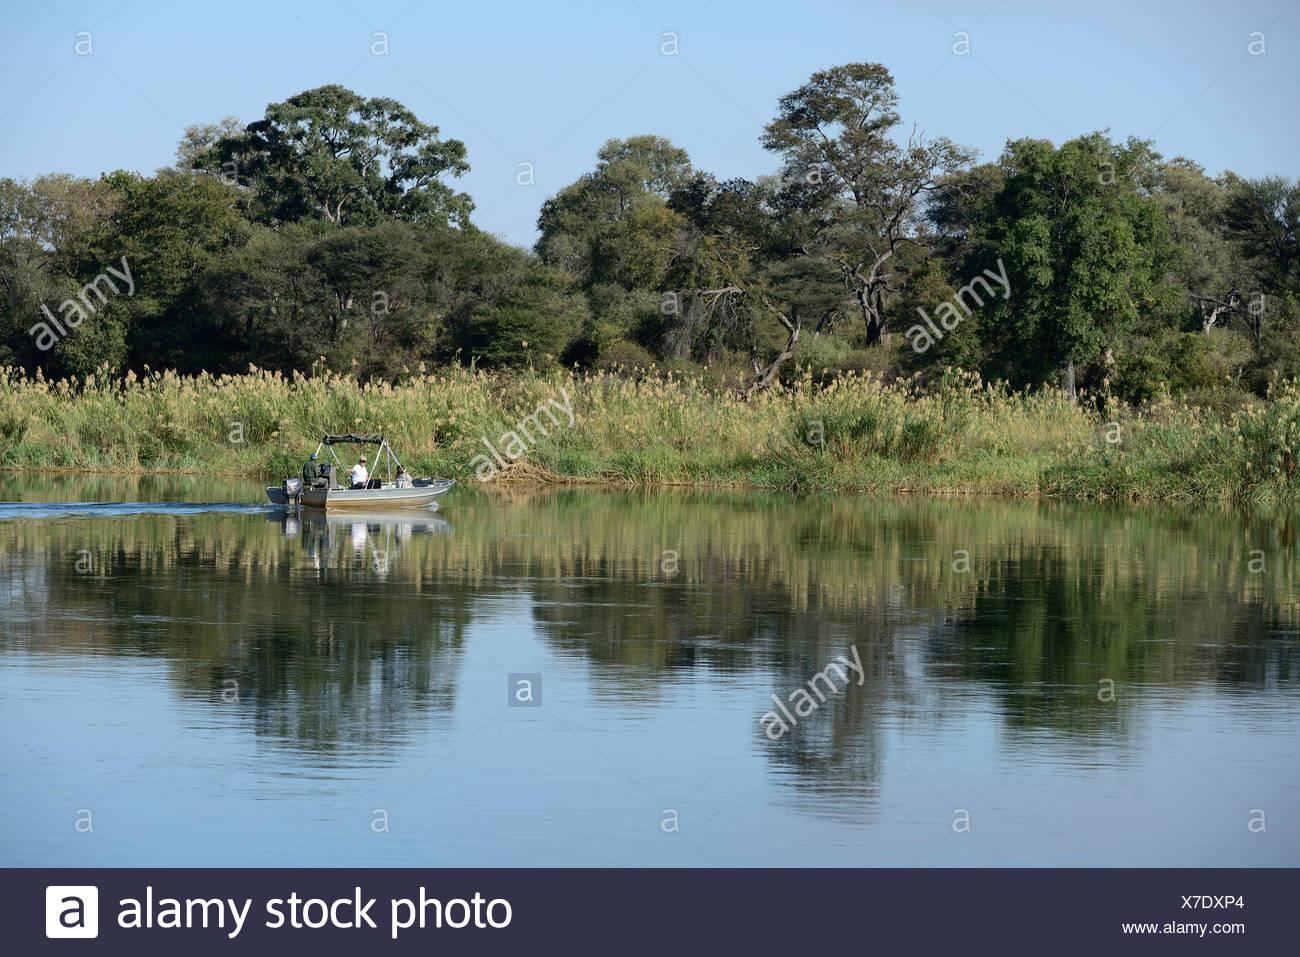 Africa, Namibia, Okavango, river, Caprivi Strip, boat, fishing, reeds, nature, Caprivi, - Stock Image